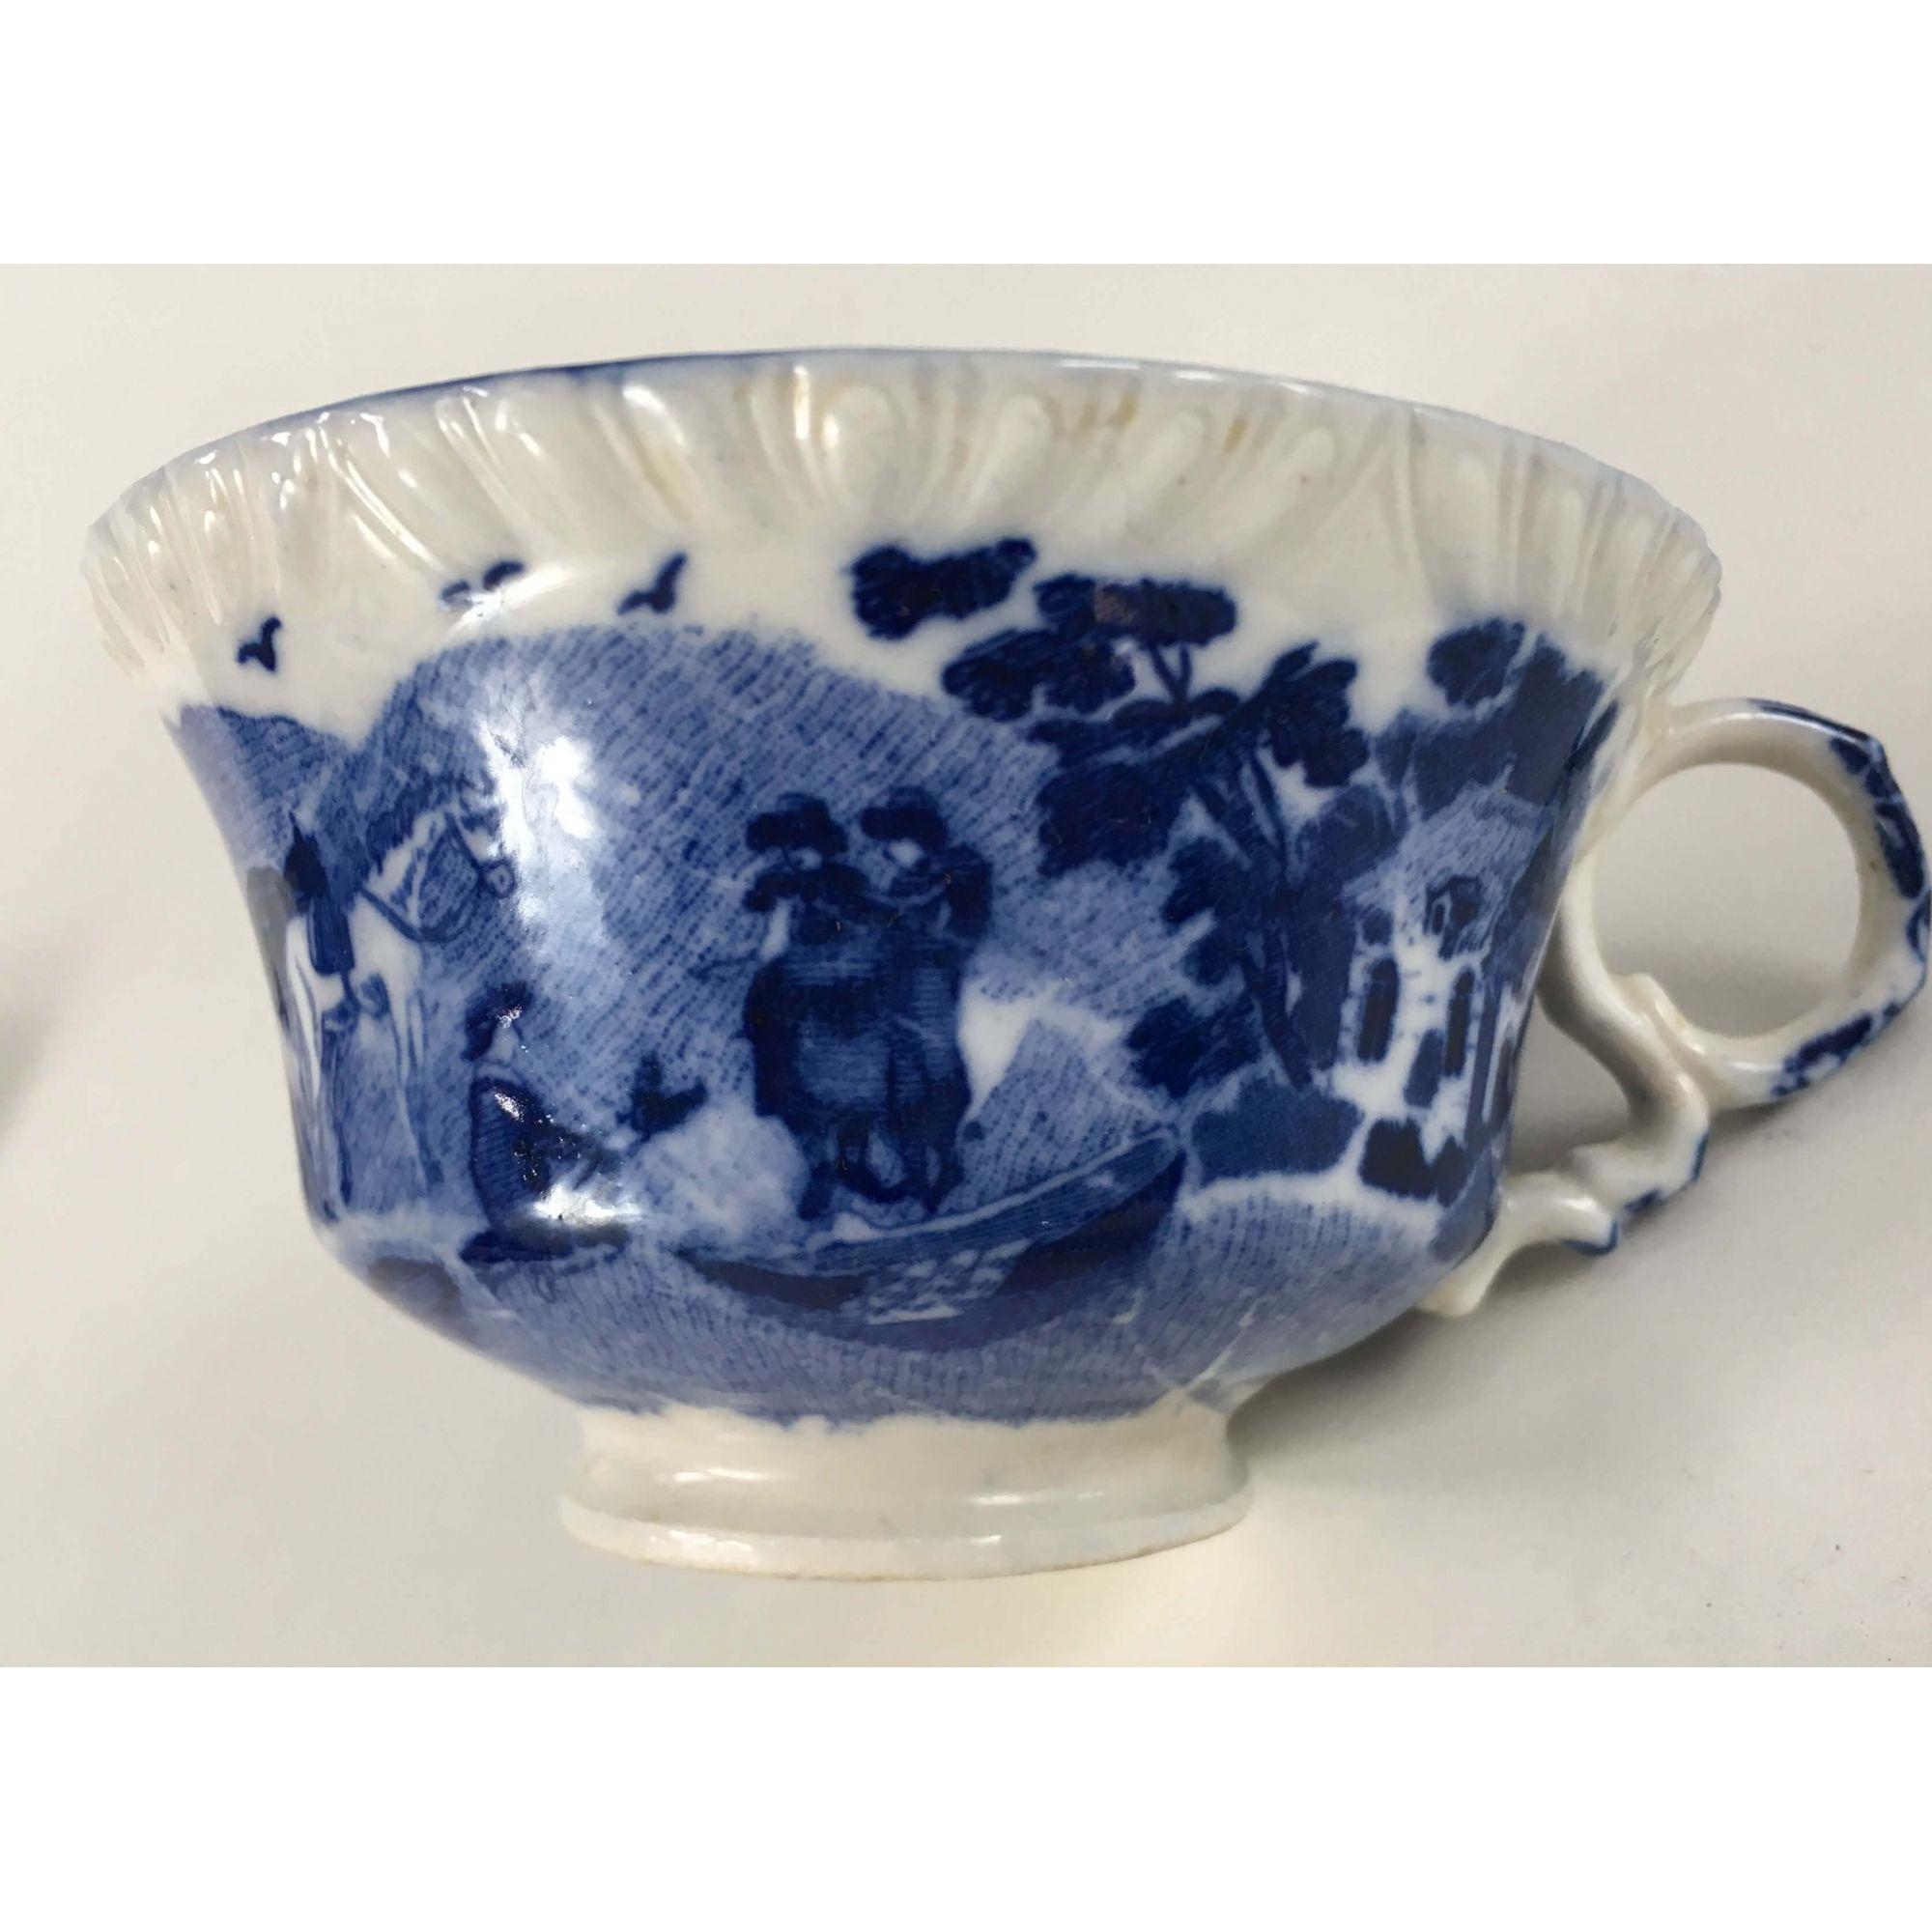 Xicara De Cha Porcelana Antiga Inglesa Fazendinha Sem Carimbo